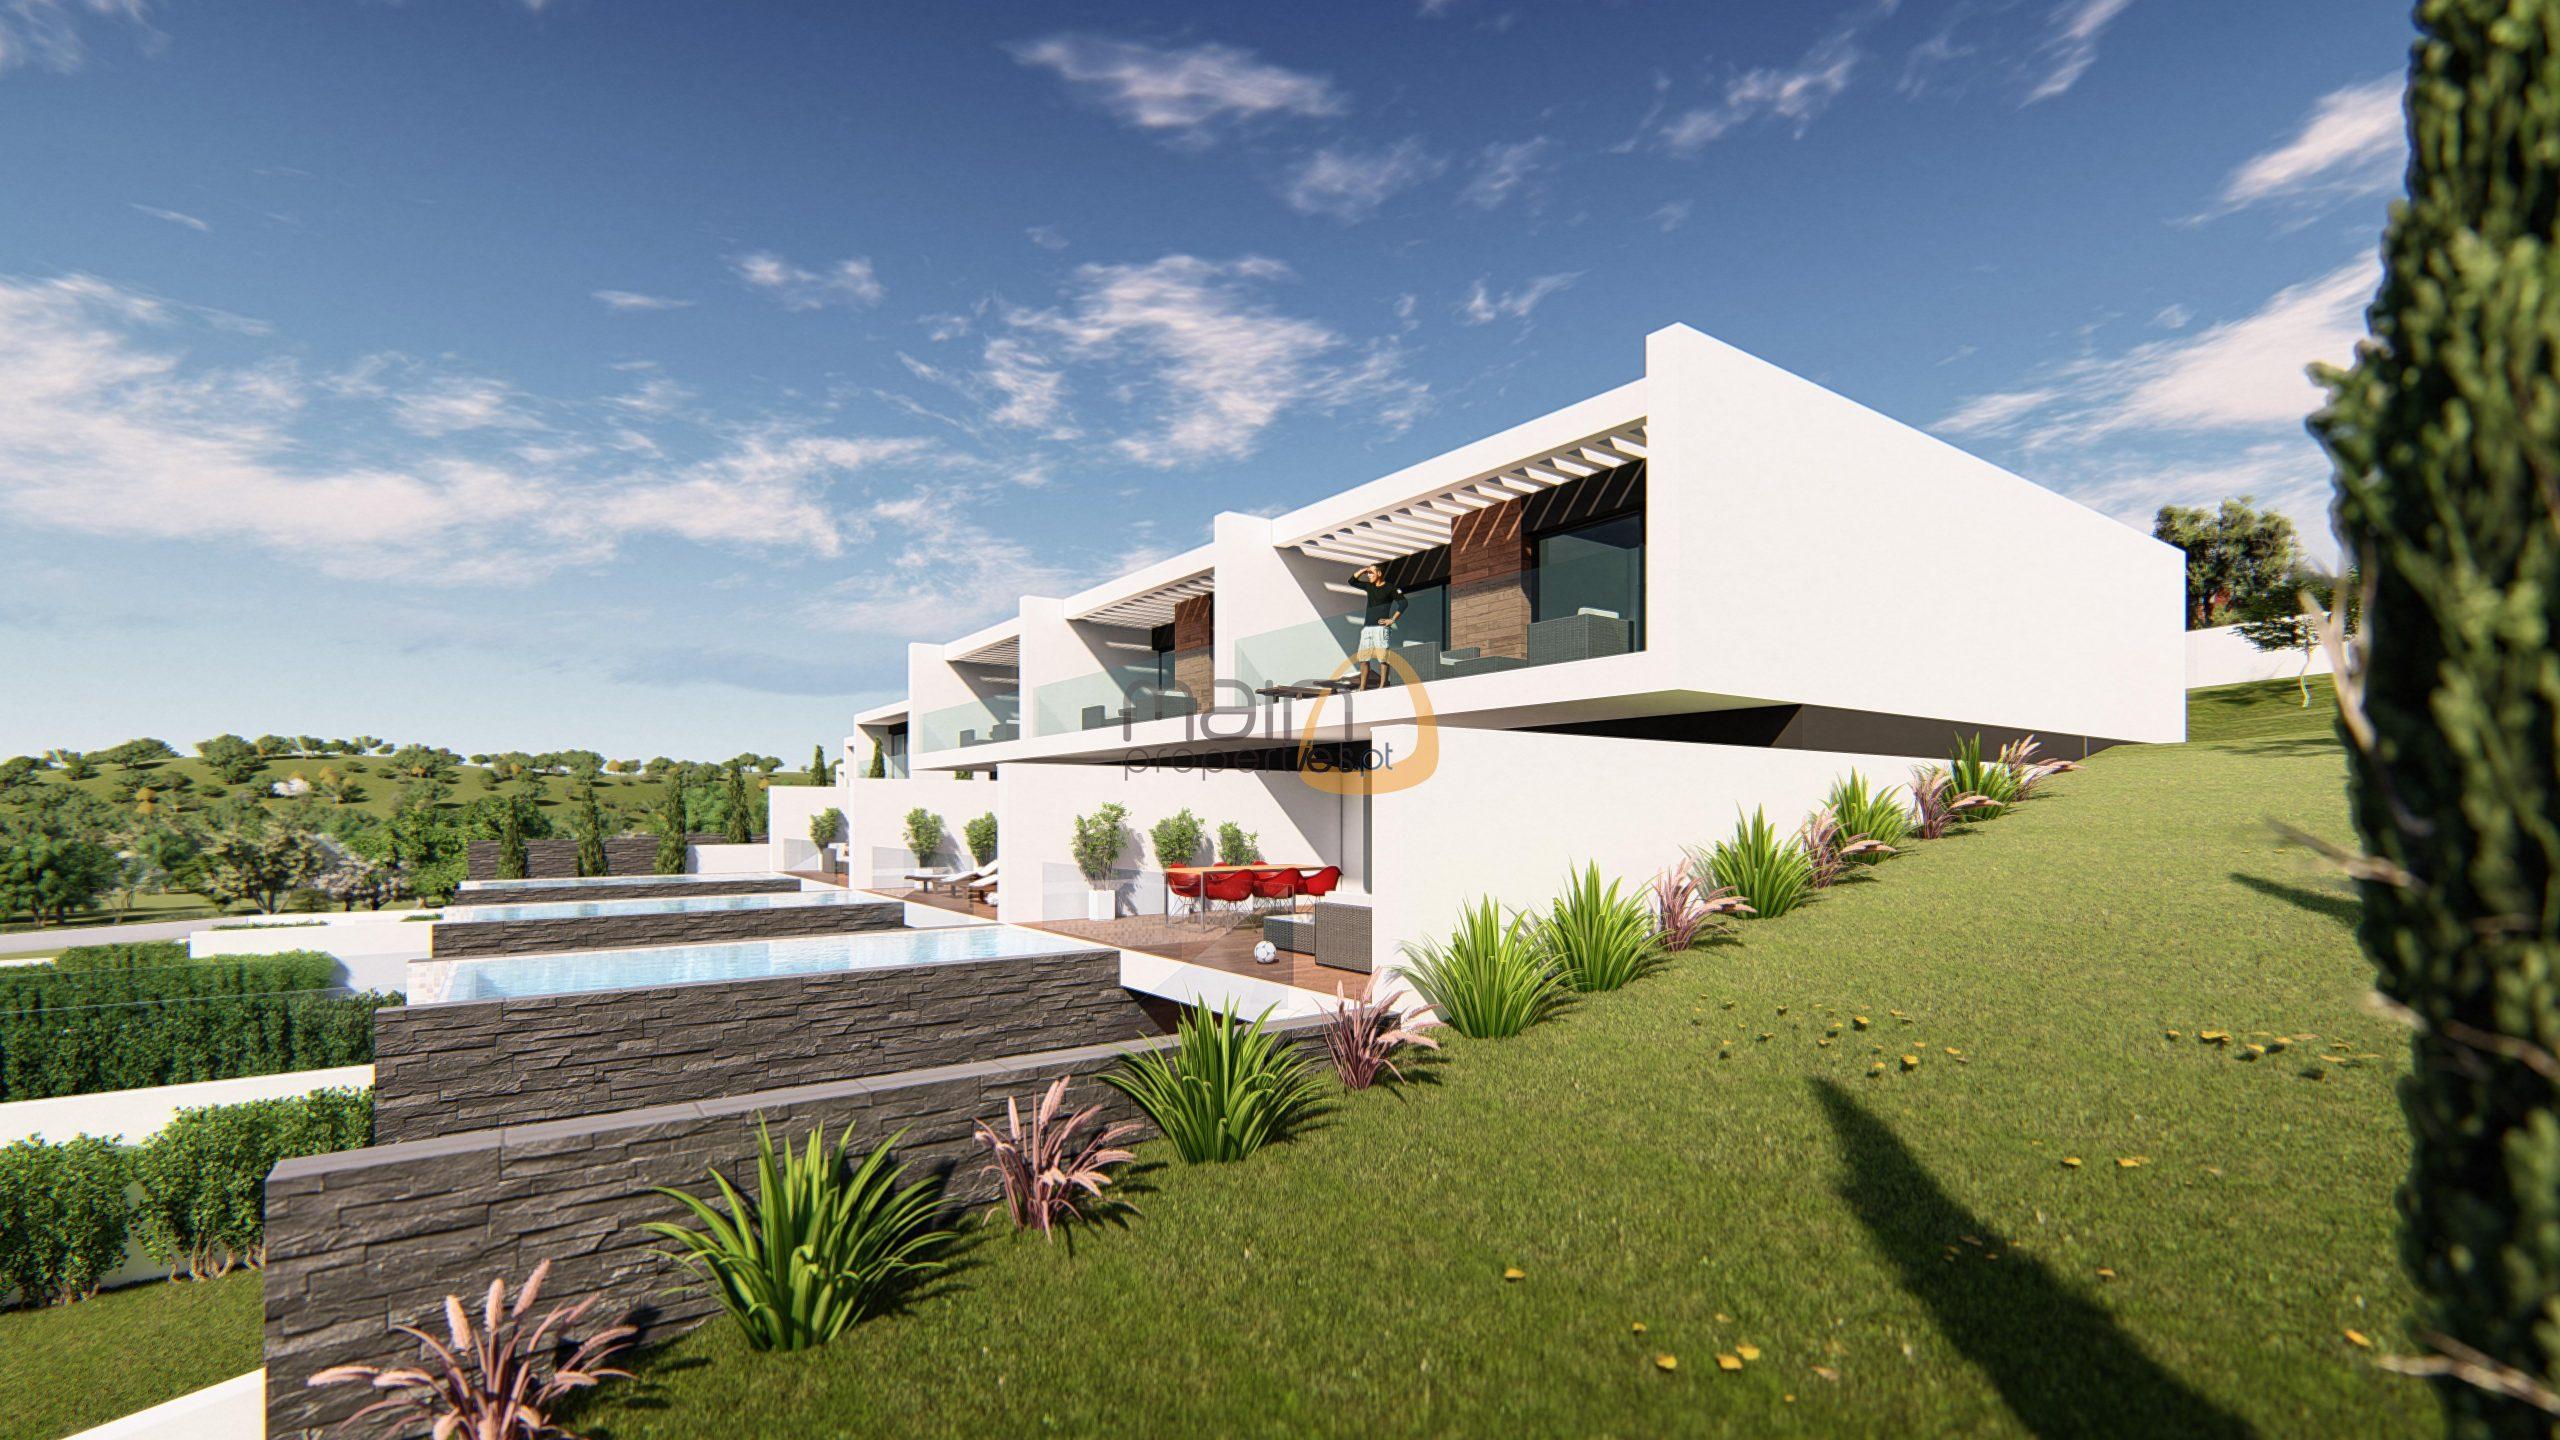 land-for-development-of-eleven-villas-with-sea-views-in-almancil-algarve-portugal-property-real-estate-01